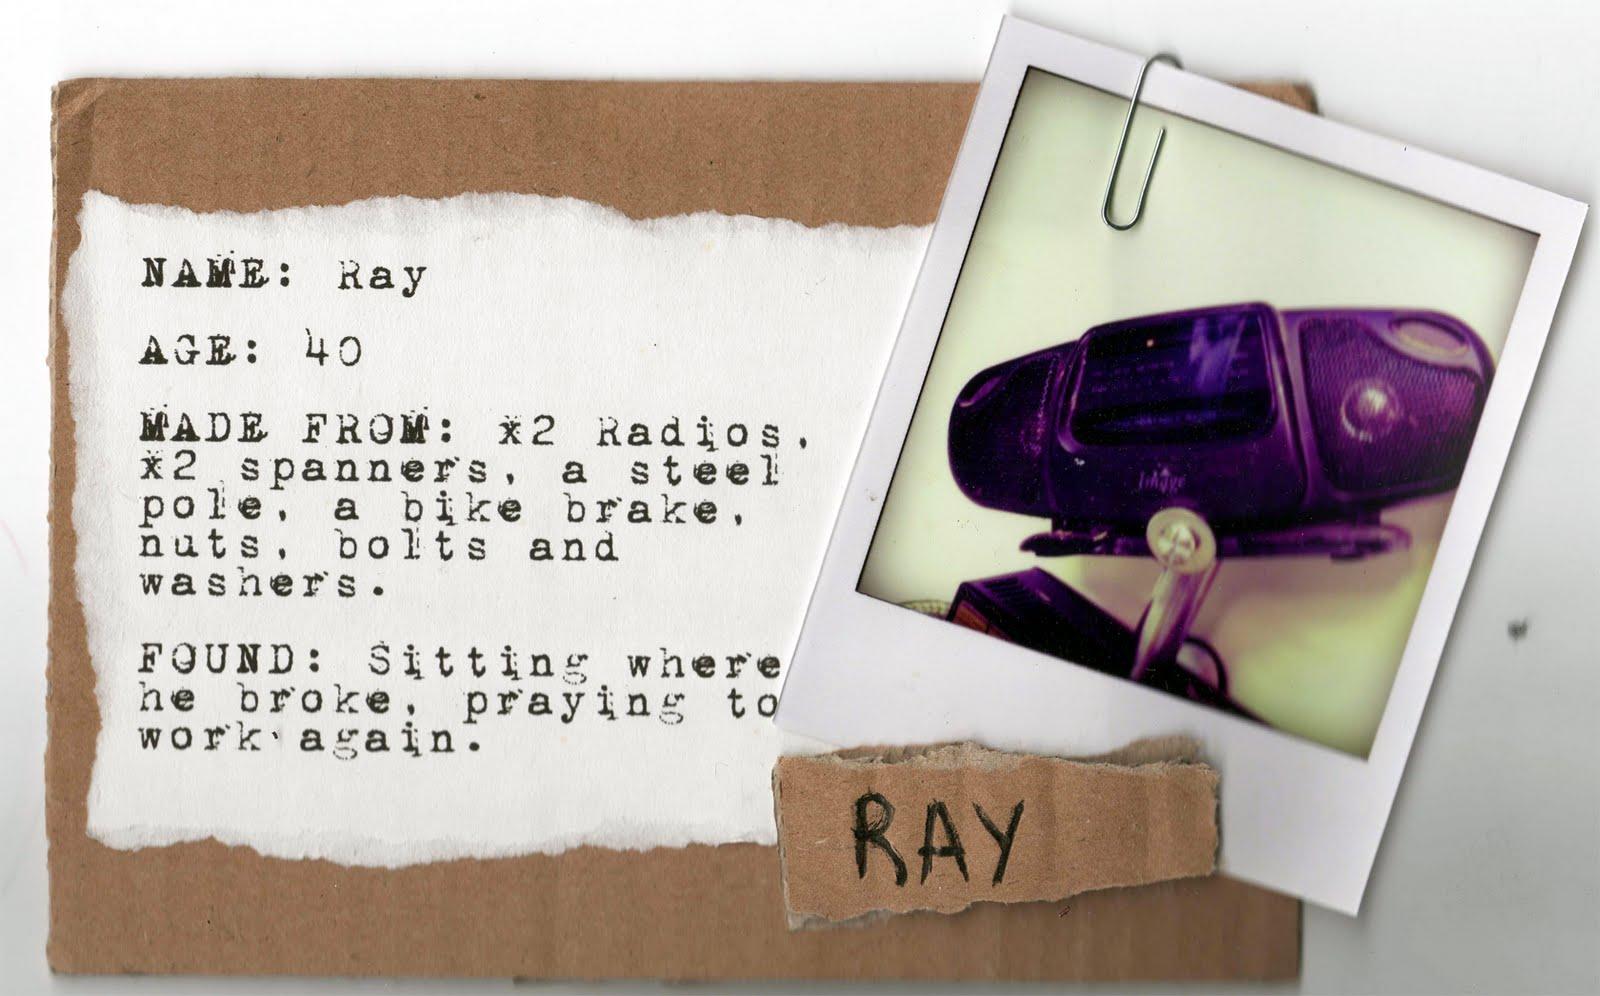 ray+profile